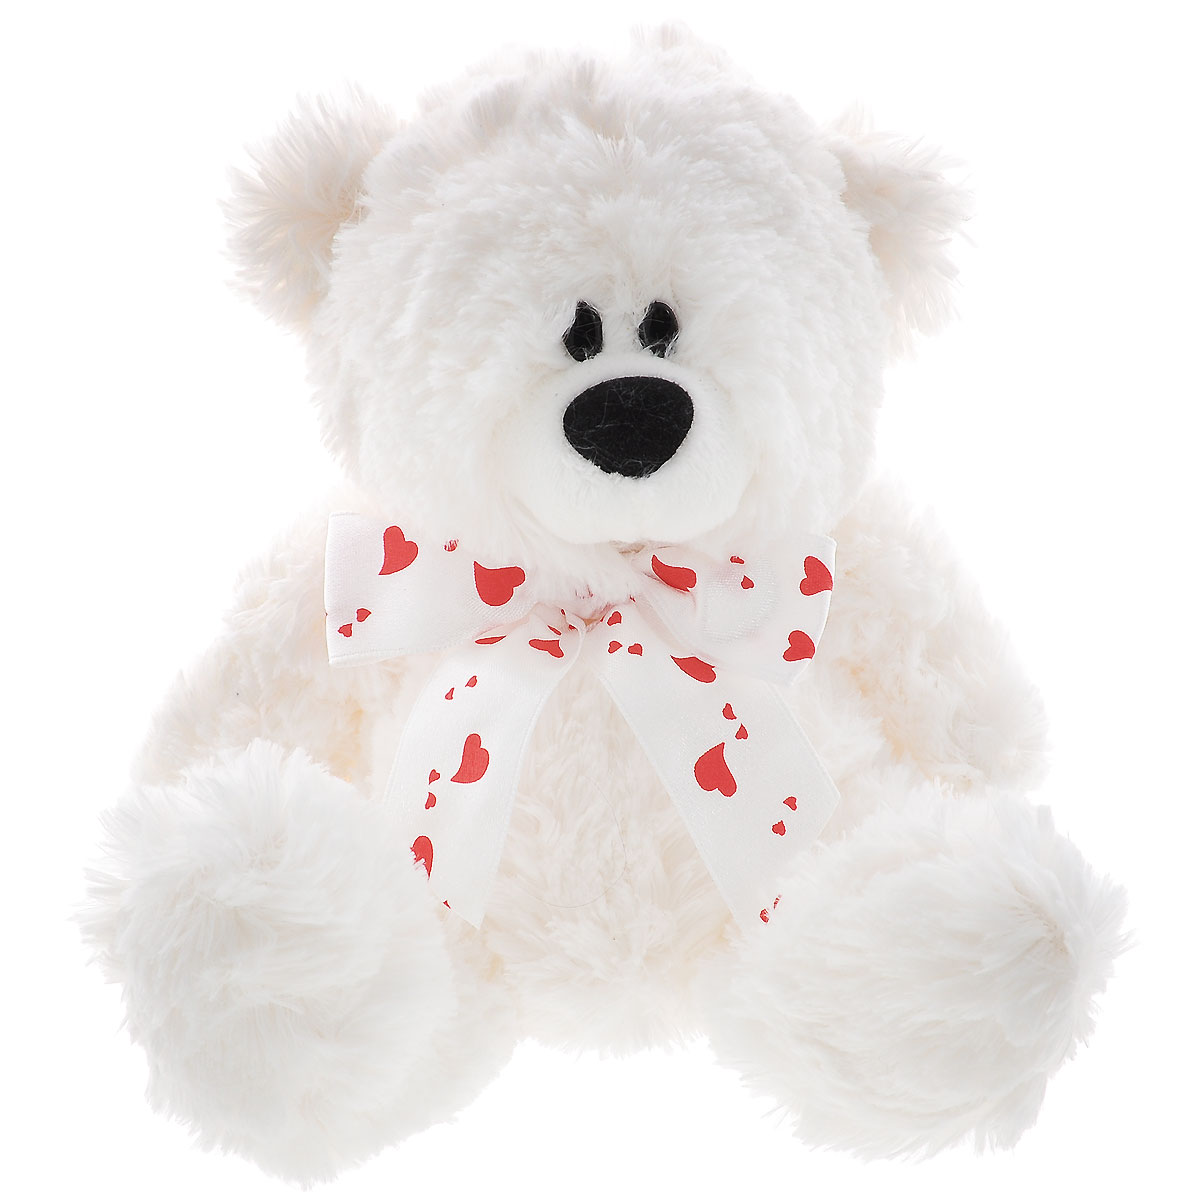 Plush Apple Мягкая игрушка Медведь с лентой, 17 см plush apple 27